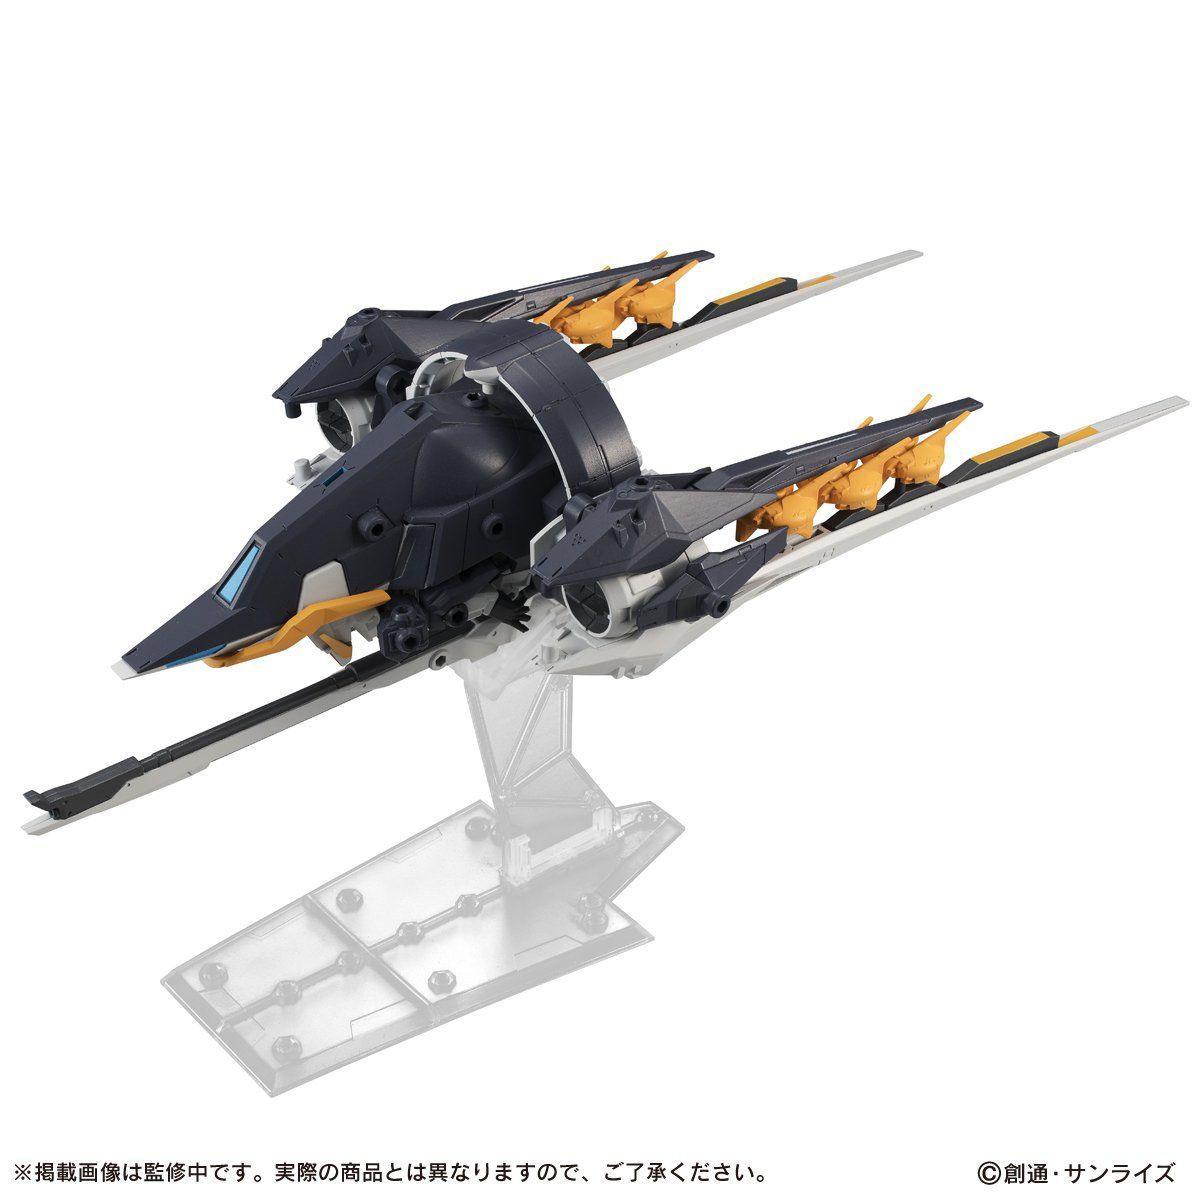 MOBILE SUIT ENSEMBLE EX09『TR-6 インレ』デフォルメ・フィギュア-002